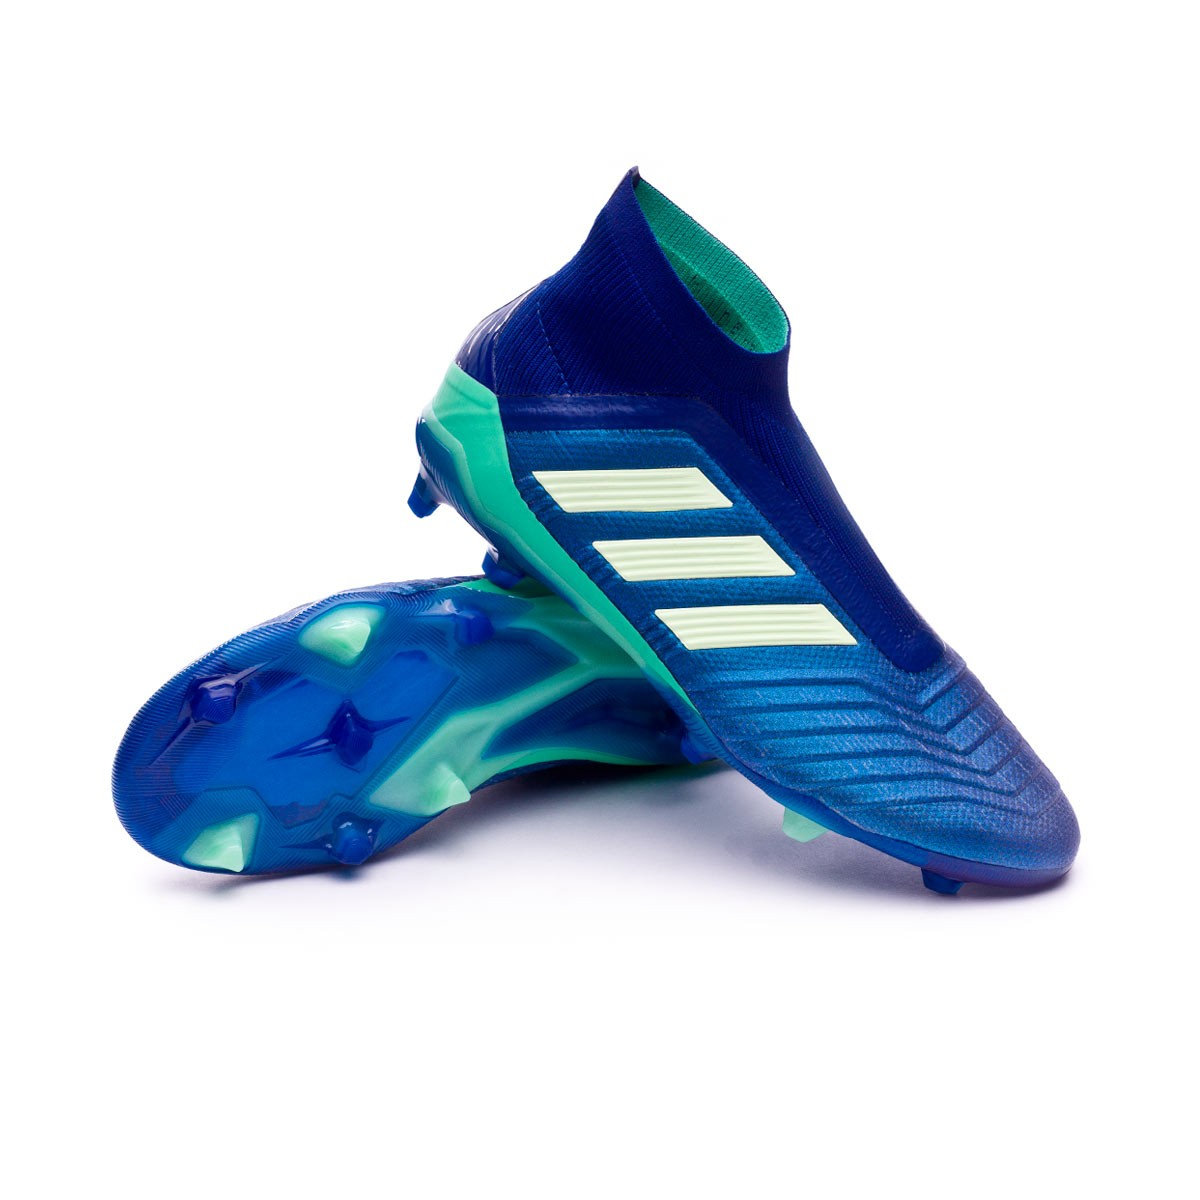 7a2ad69da9b6 Football Boots adidas Kids Predator 18+ FG Unity ink-Aero green-Hi ...